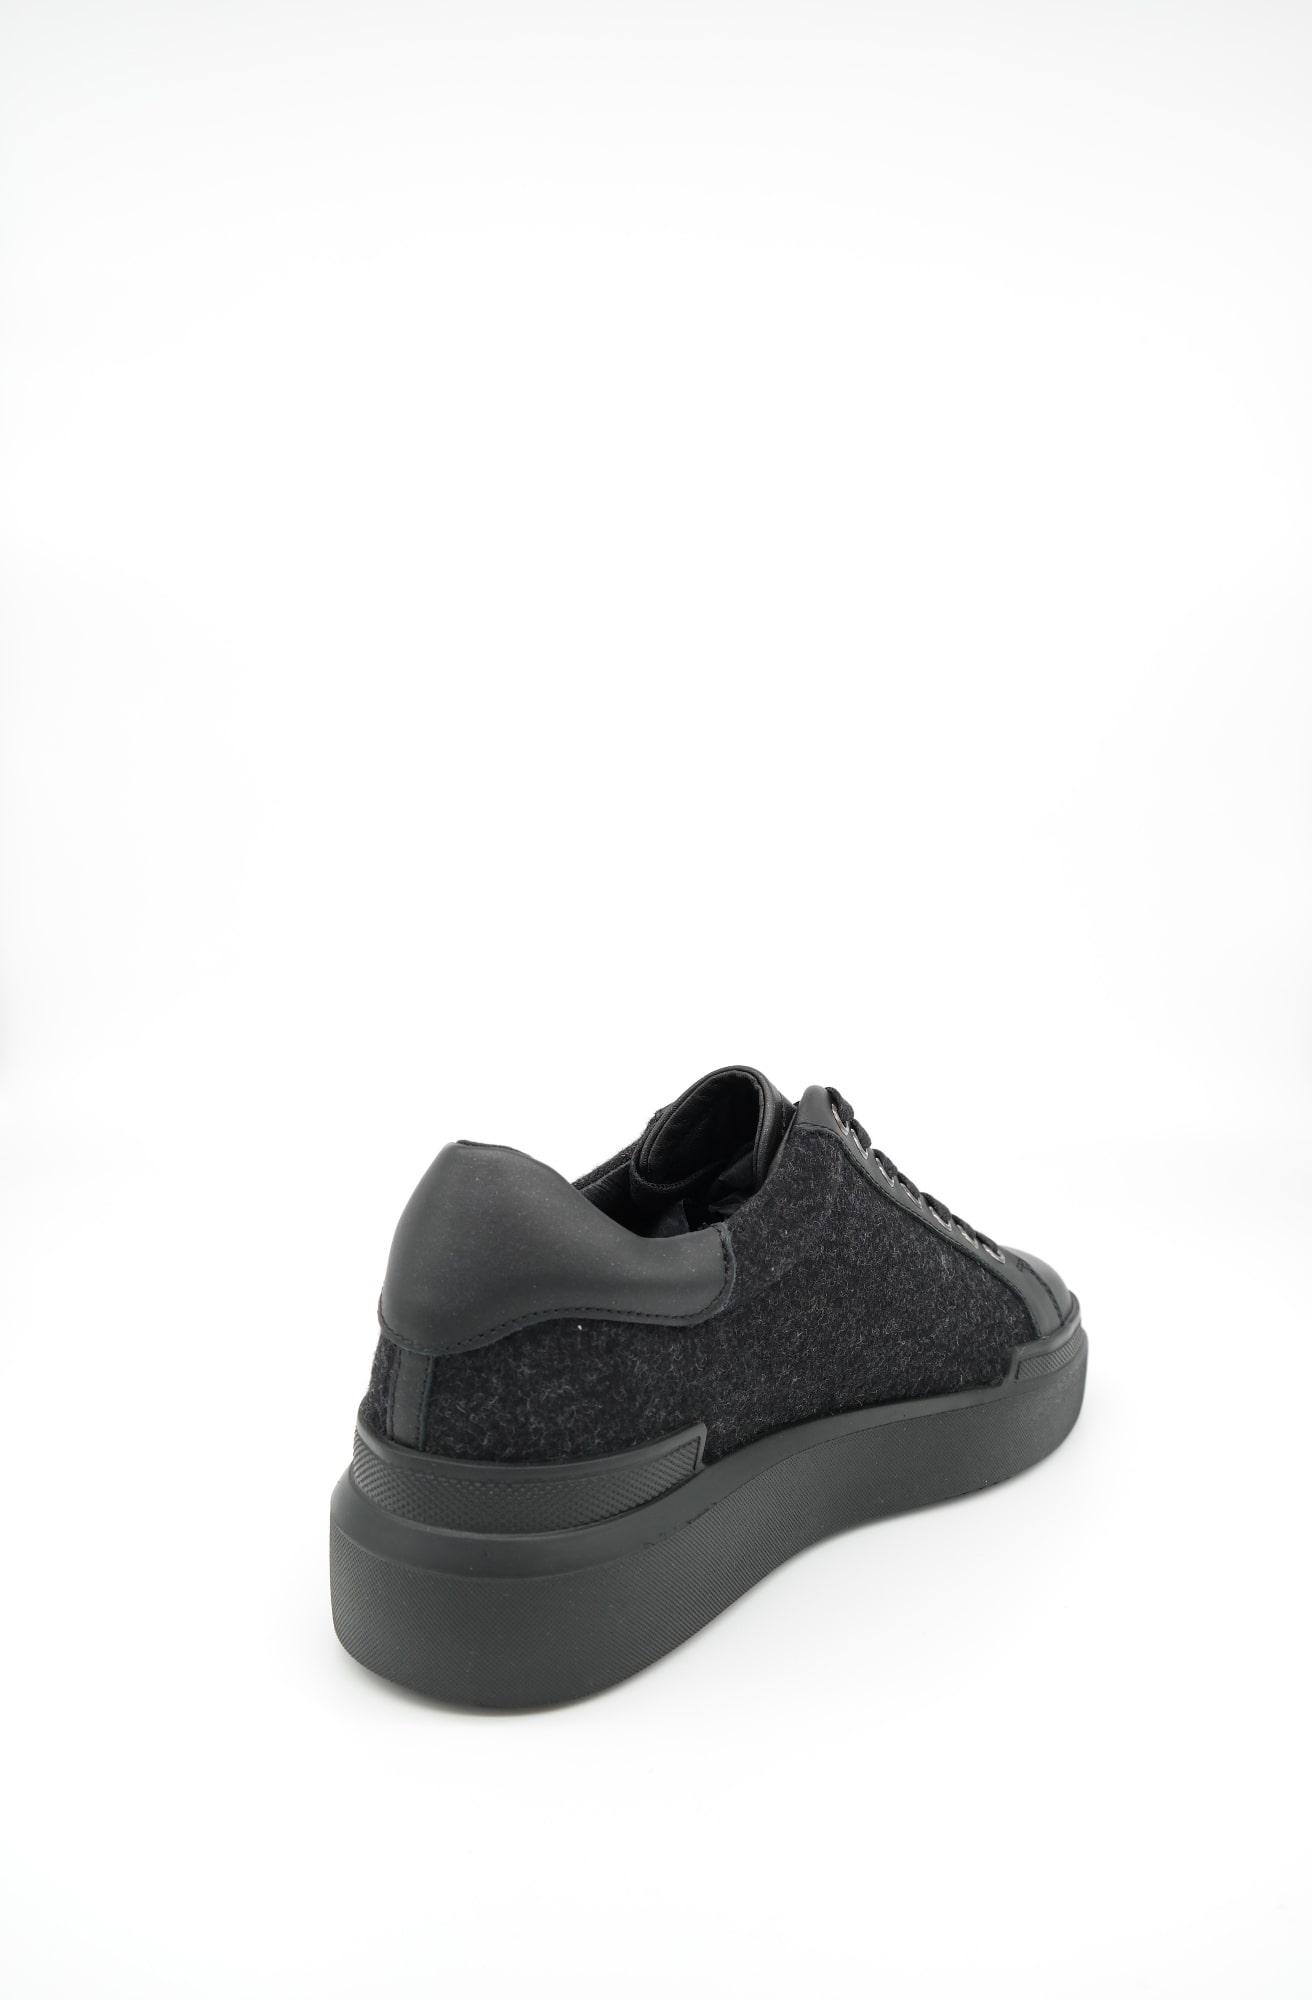 Schwarz BOGNER Damen Schuhe Low Sneaker Hollywood 12 Leder-Filz-Mix